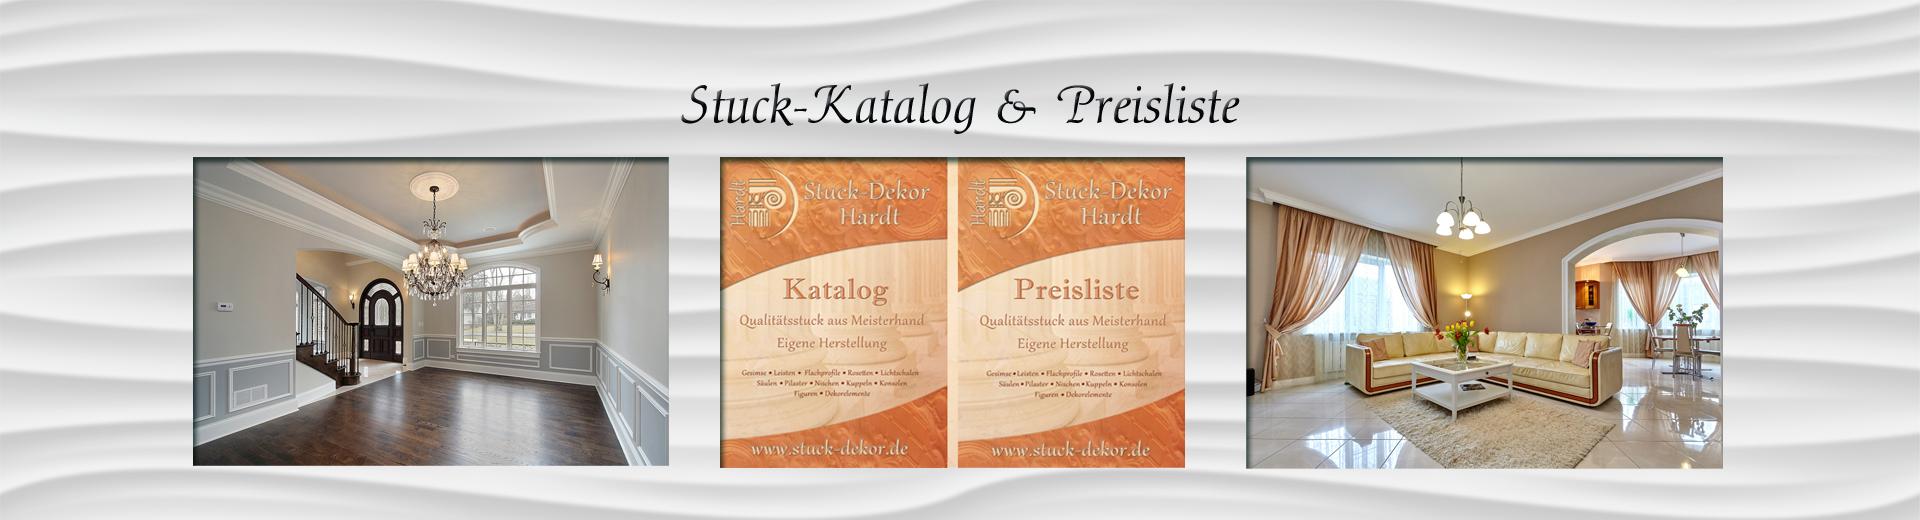 Stuck-Katalog online